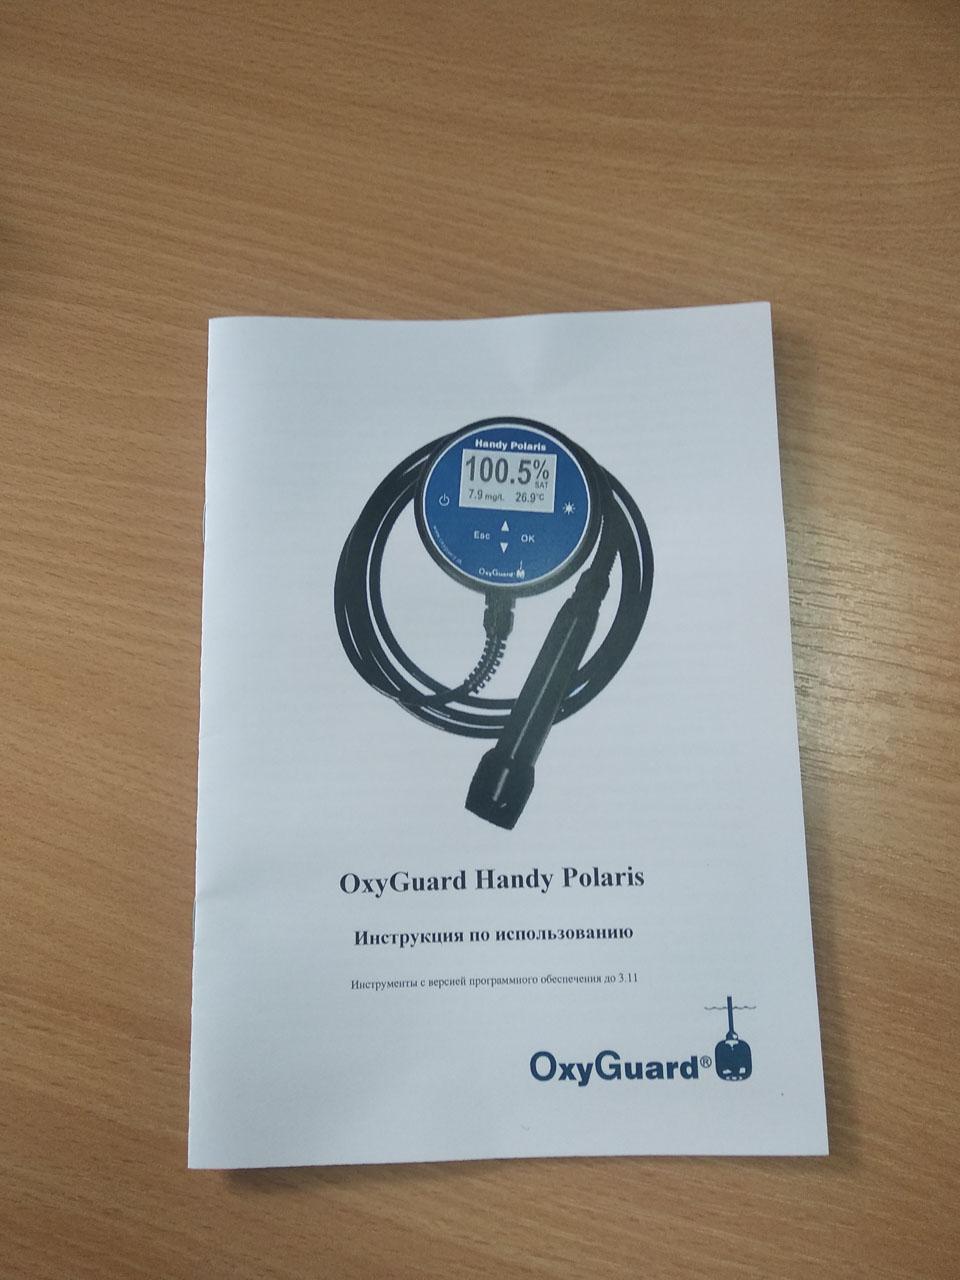 Оксиметр OxyGuard Handy Polaris